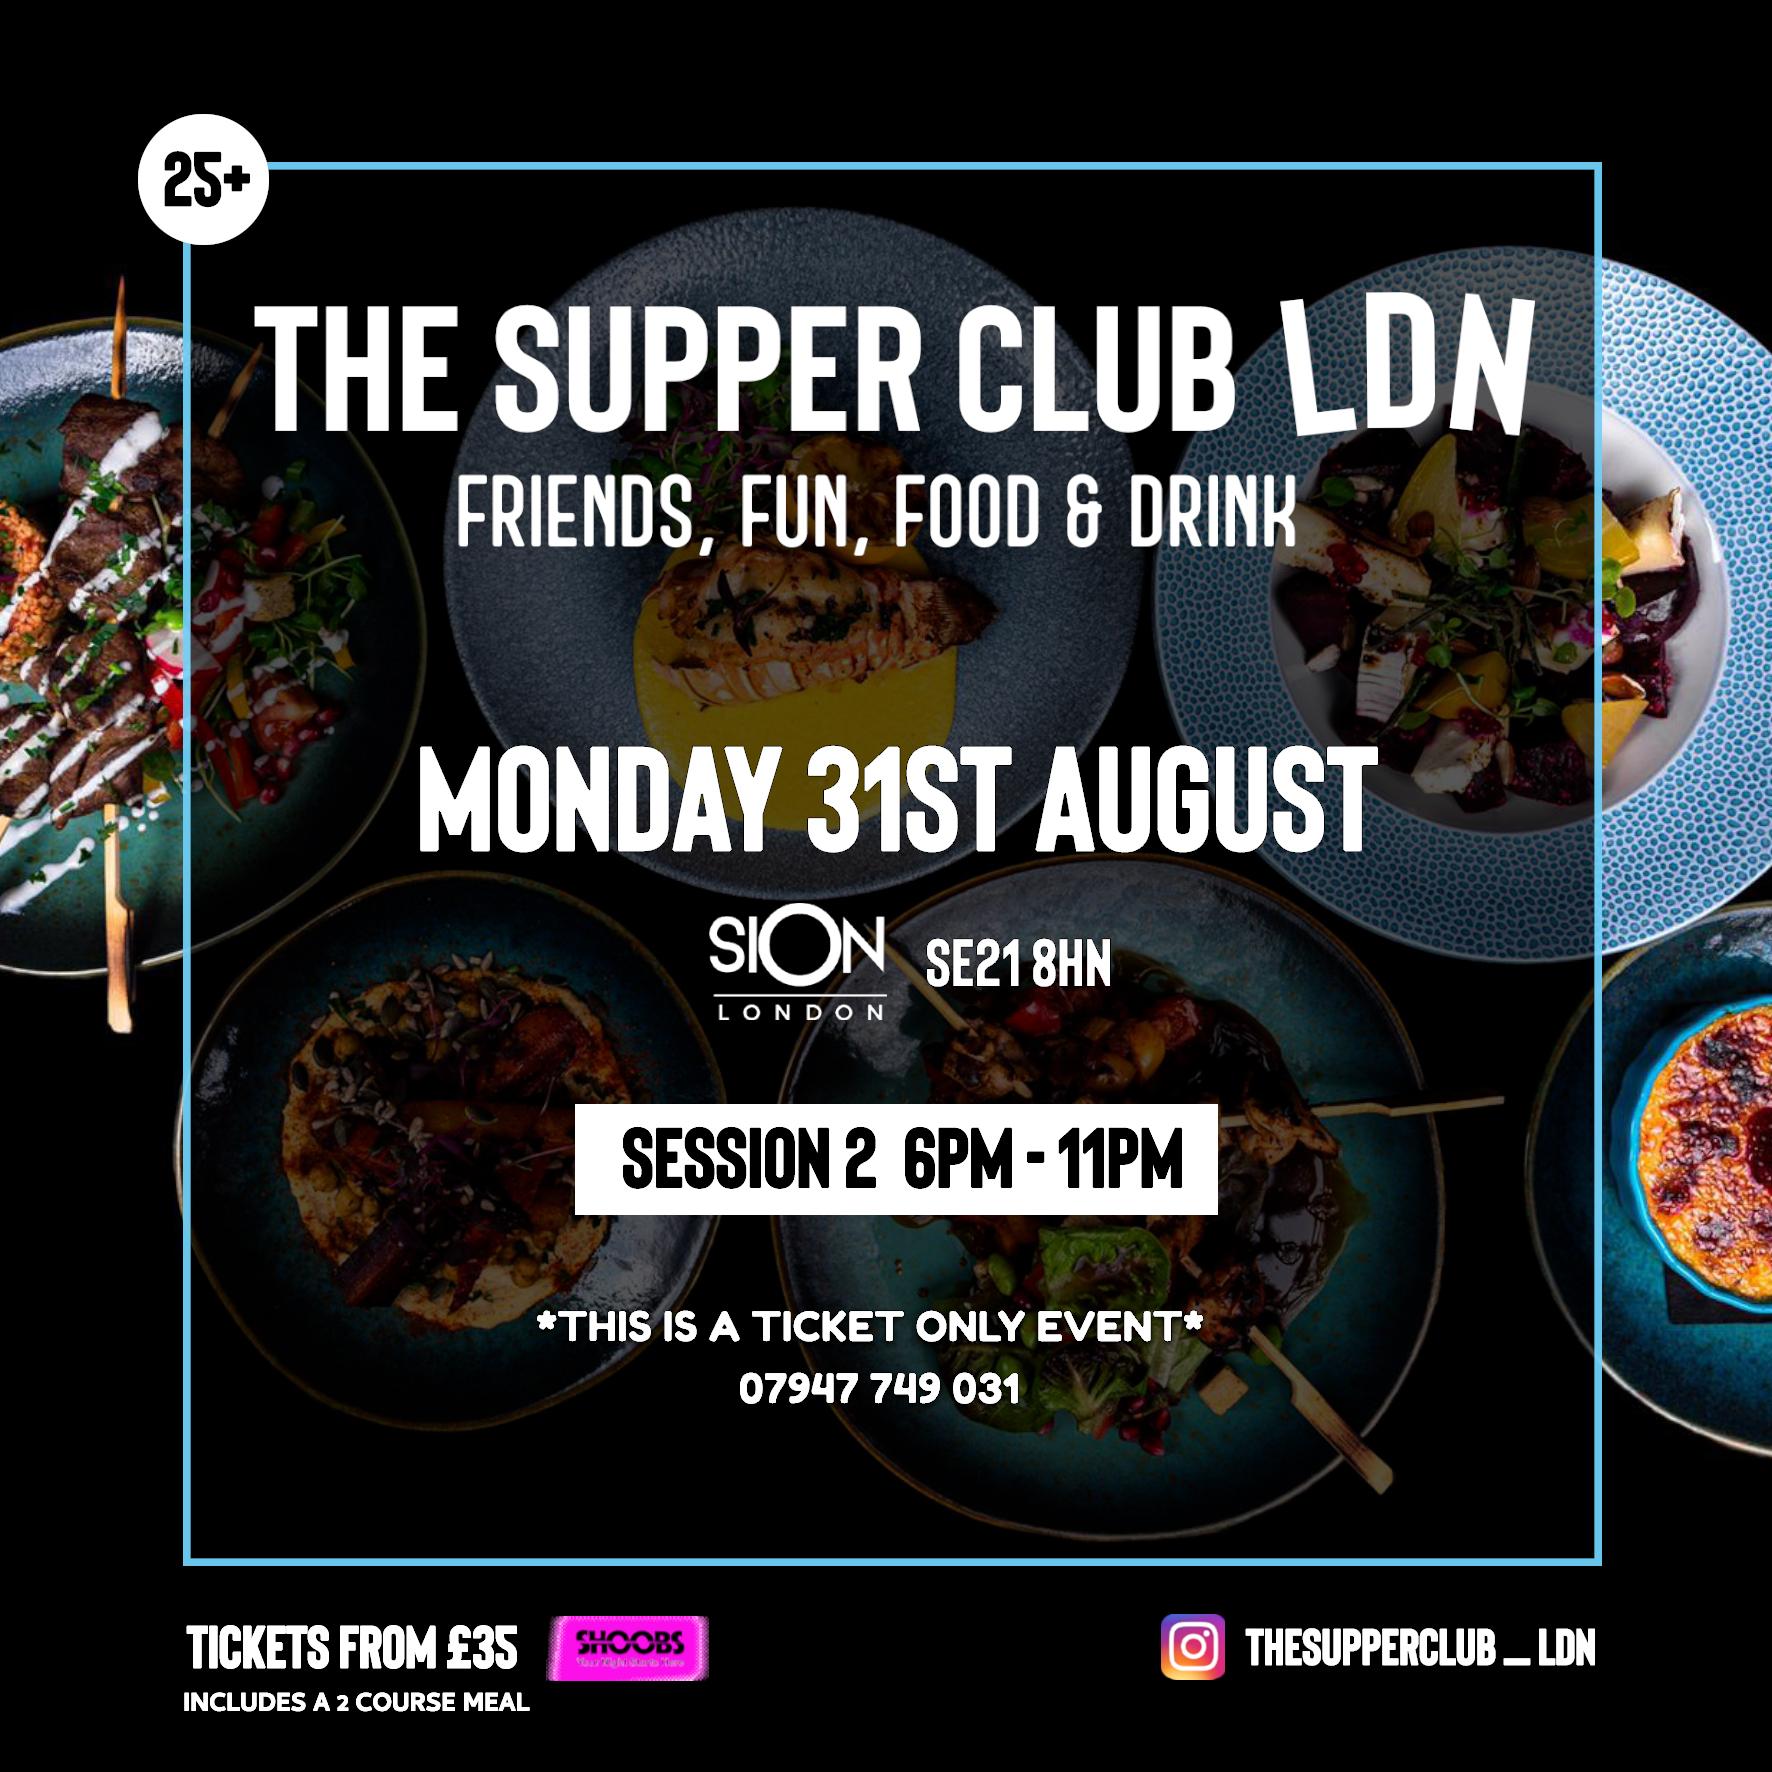 The Supper Club LDN - Mon Aug 31st (6pm-11pm)